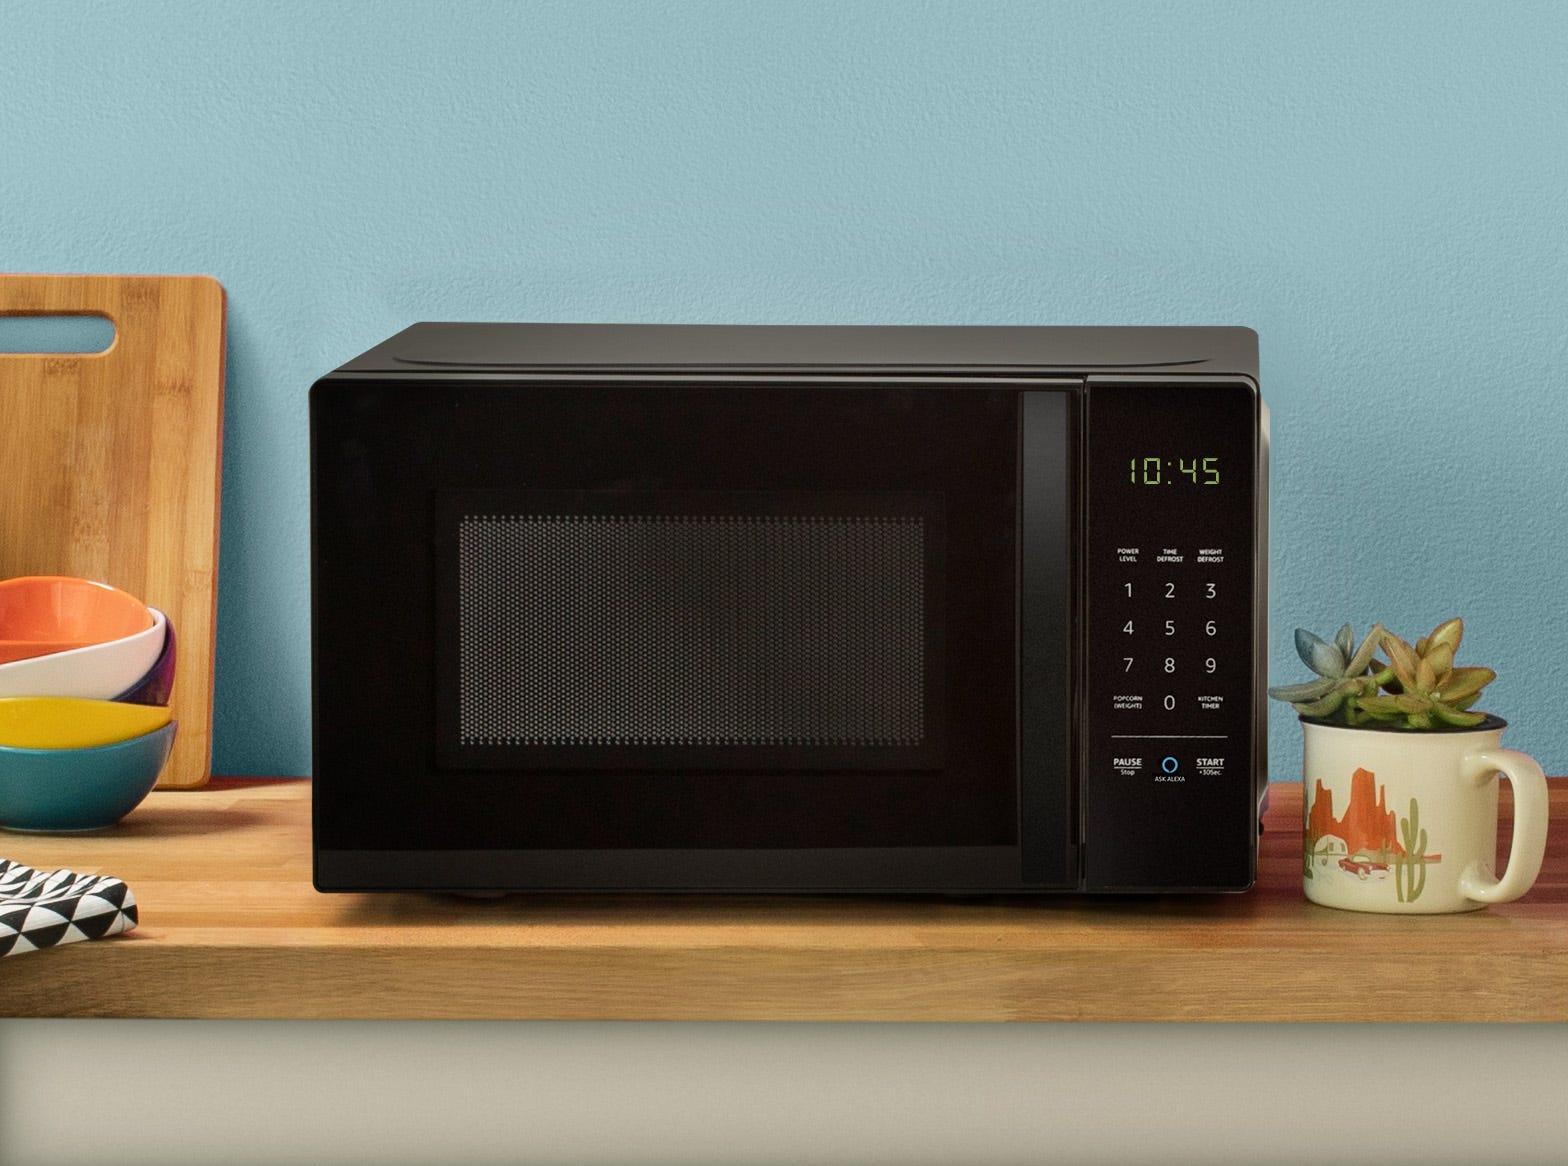 'Alexa, nuke the popcorn, heat up the coffee:' We review Amazon's $59.99 microwave